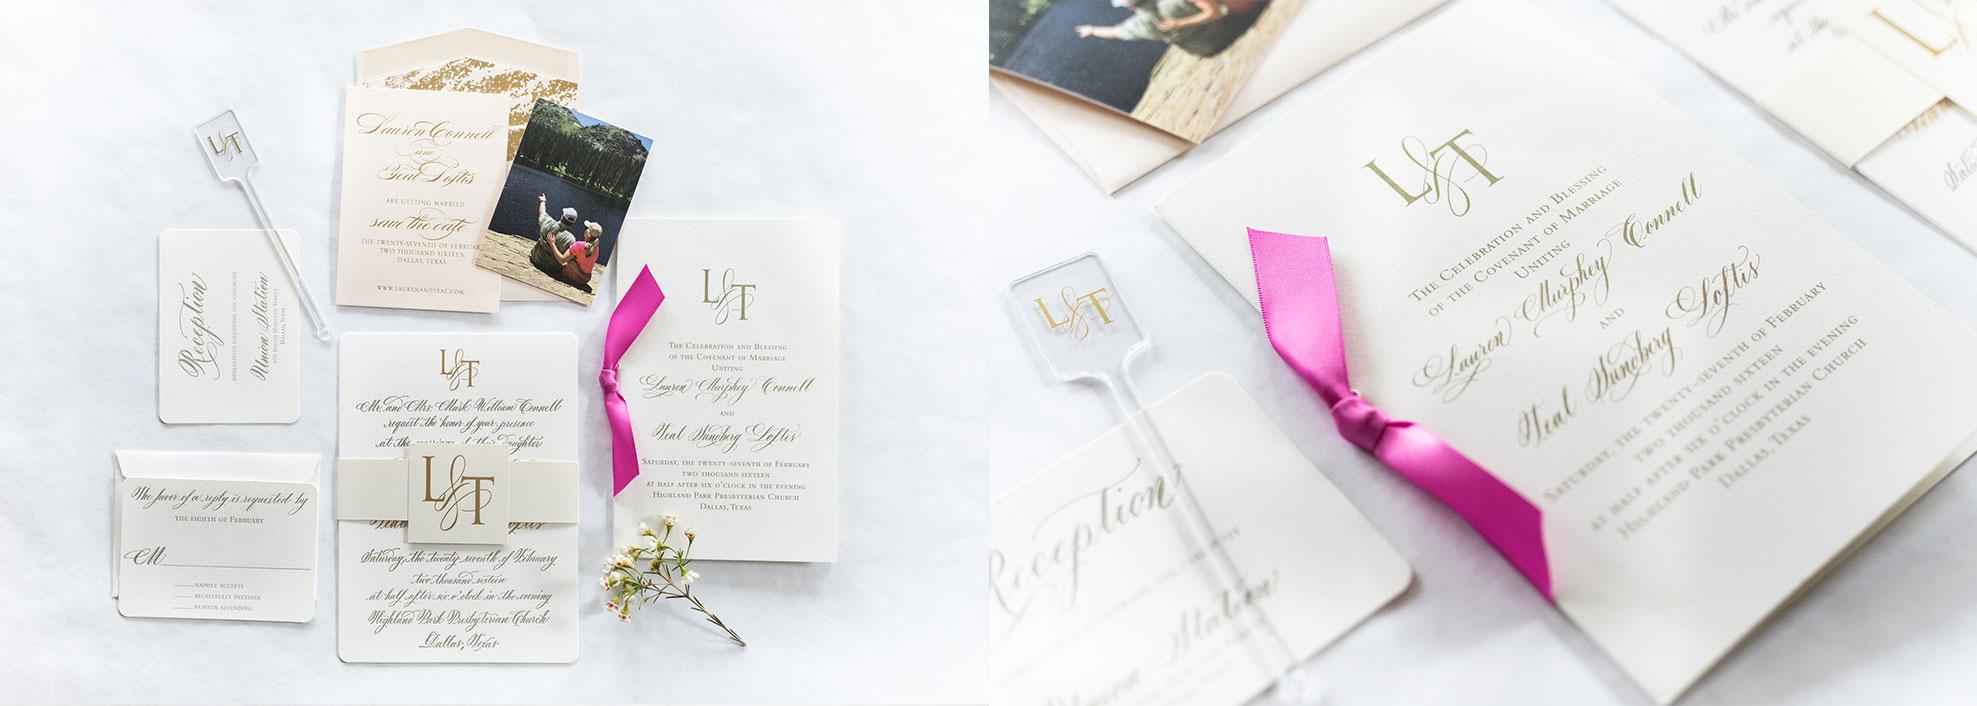 wedding-slideshow3.jpg